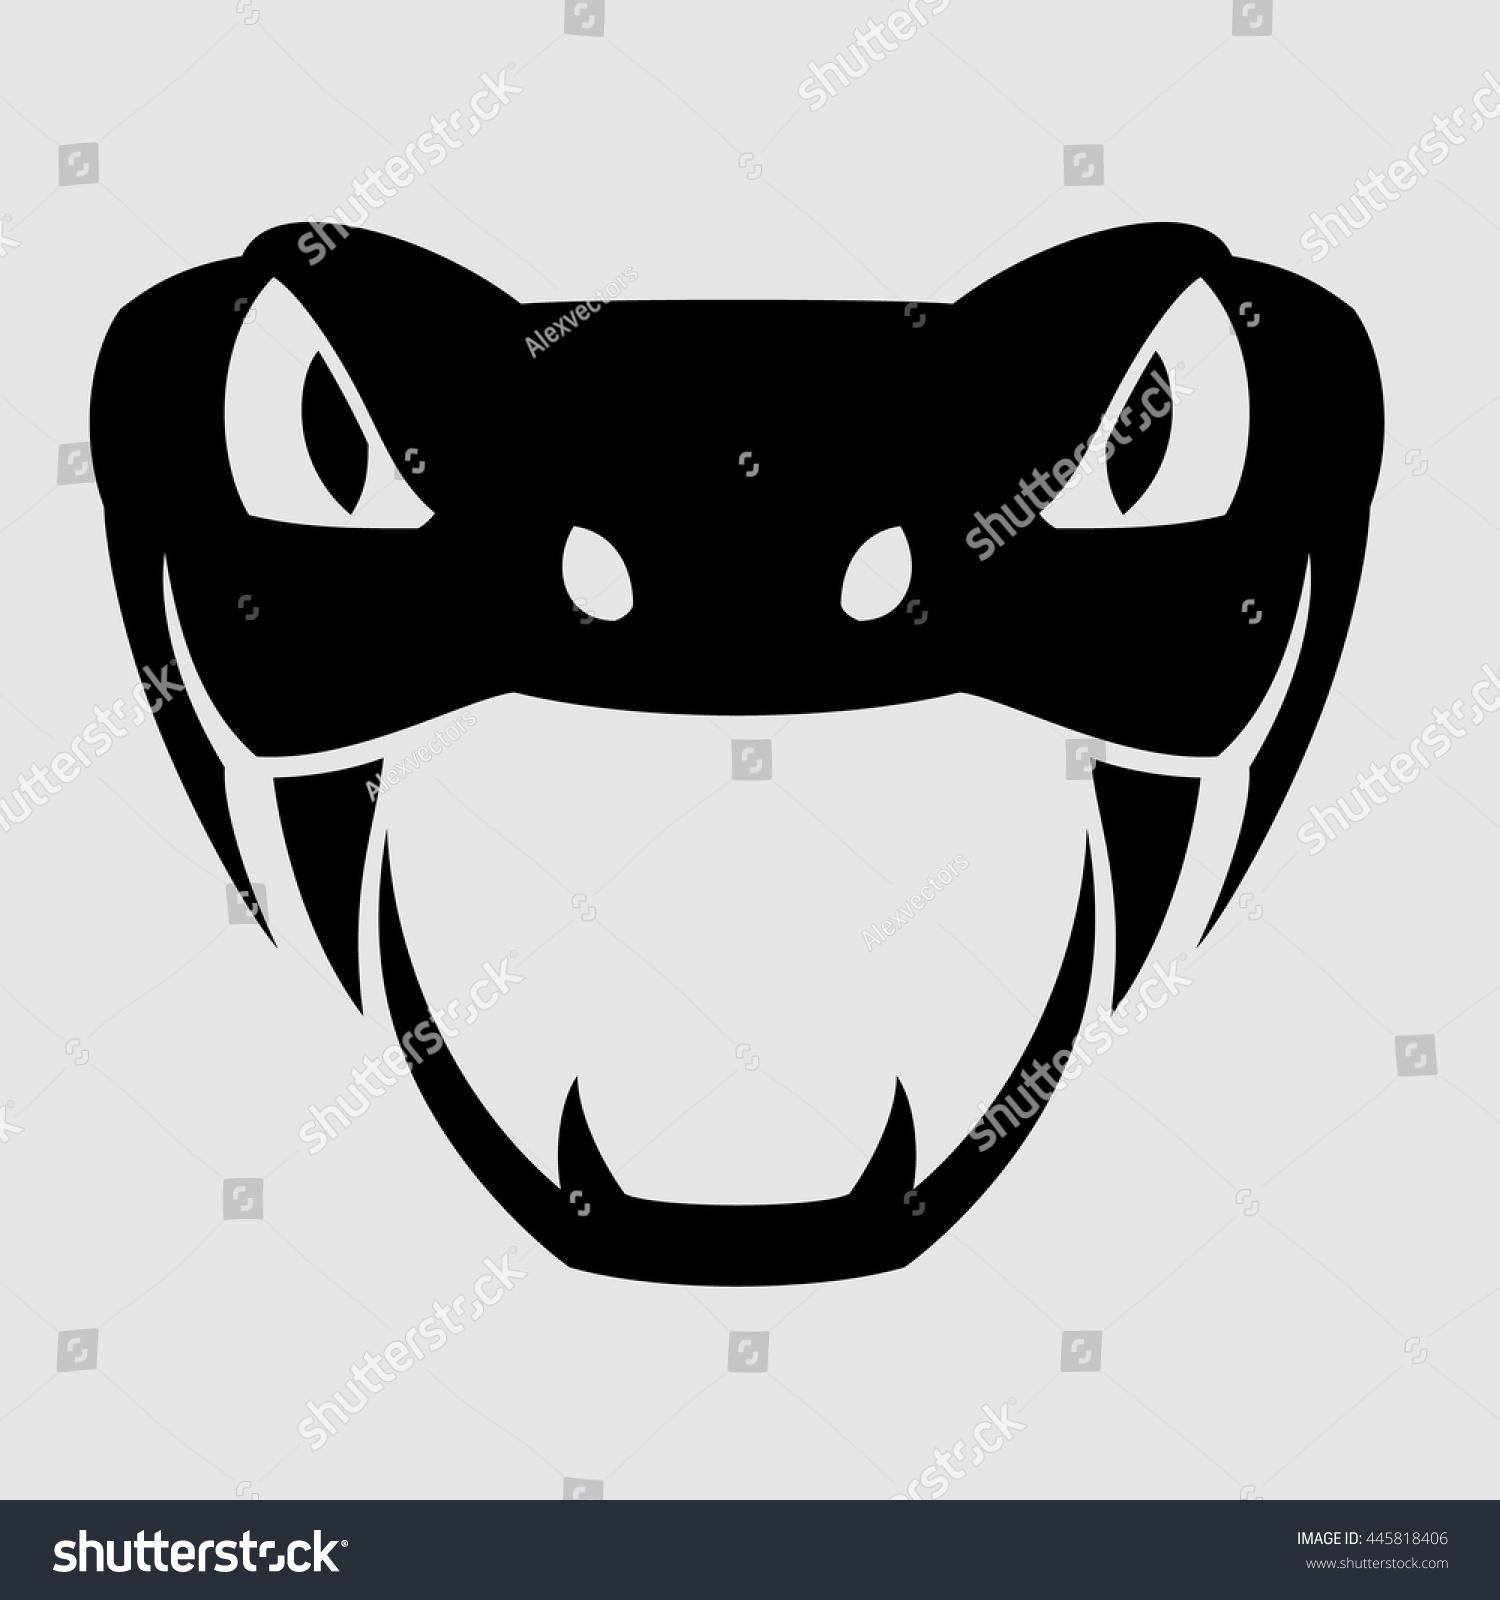 Rattlesnake head logo - photo#18